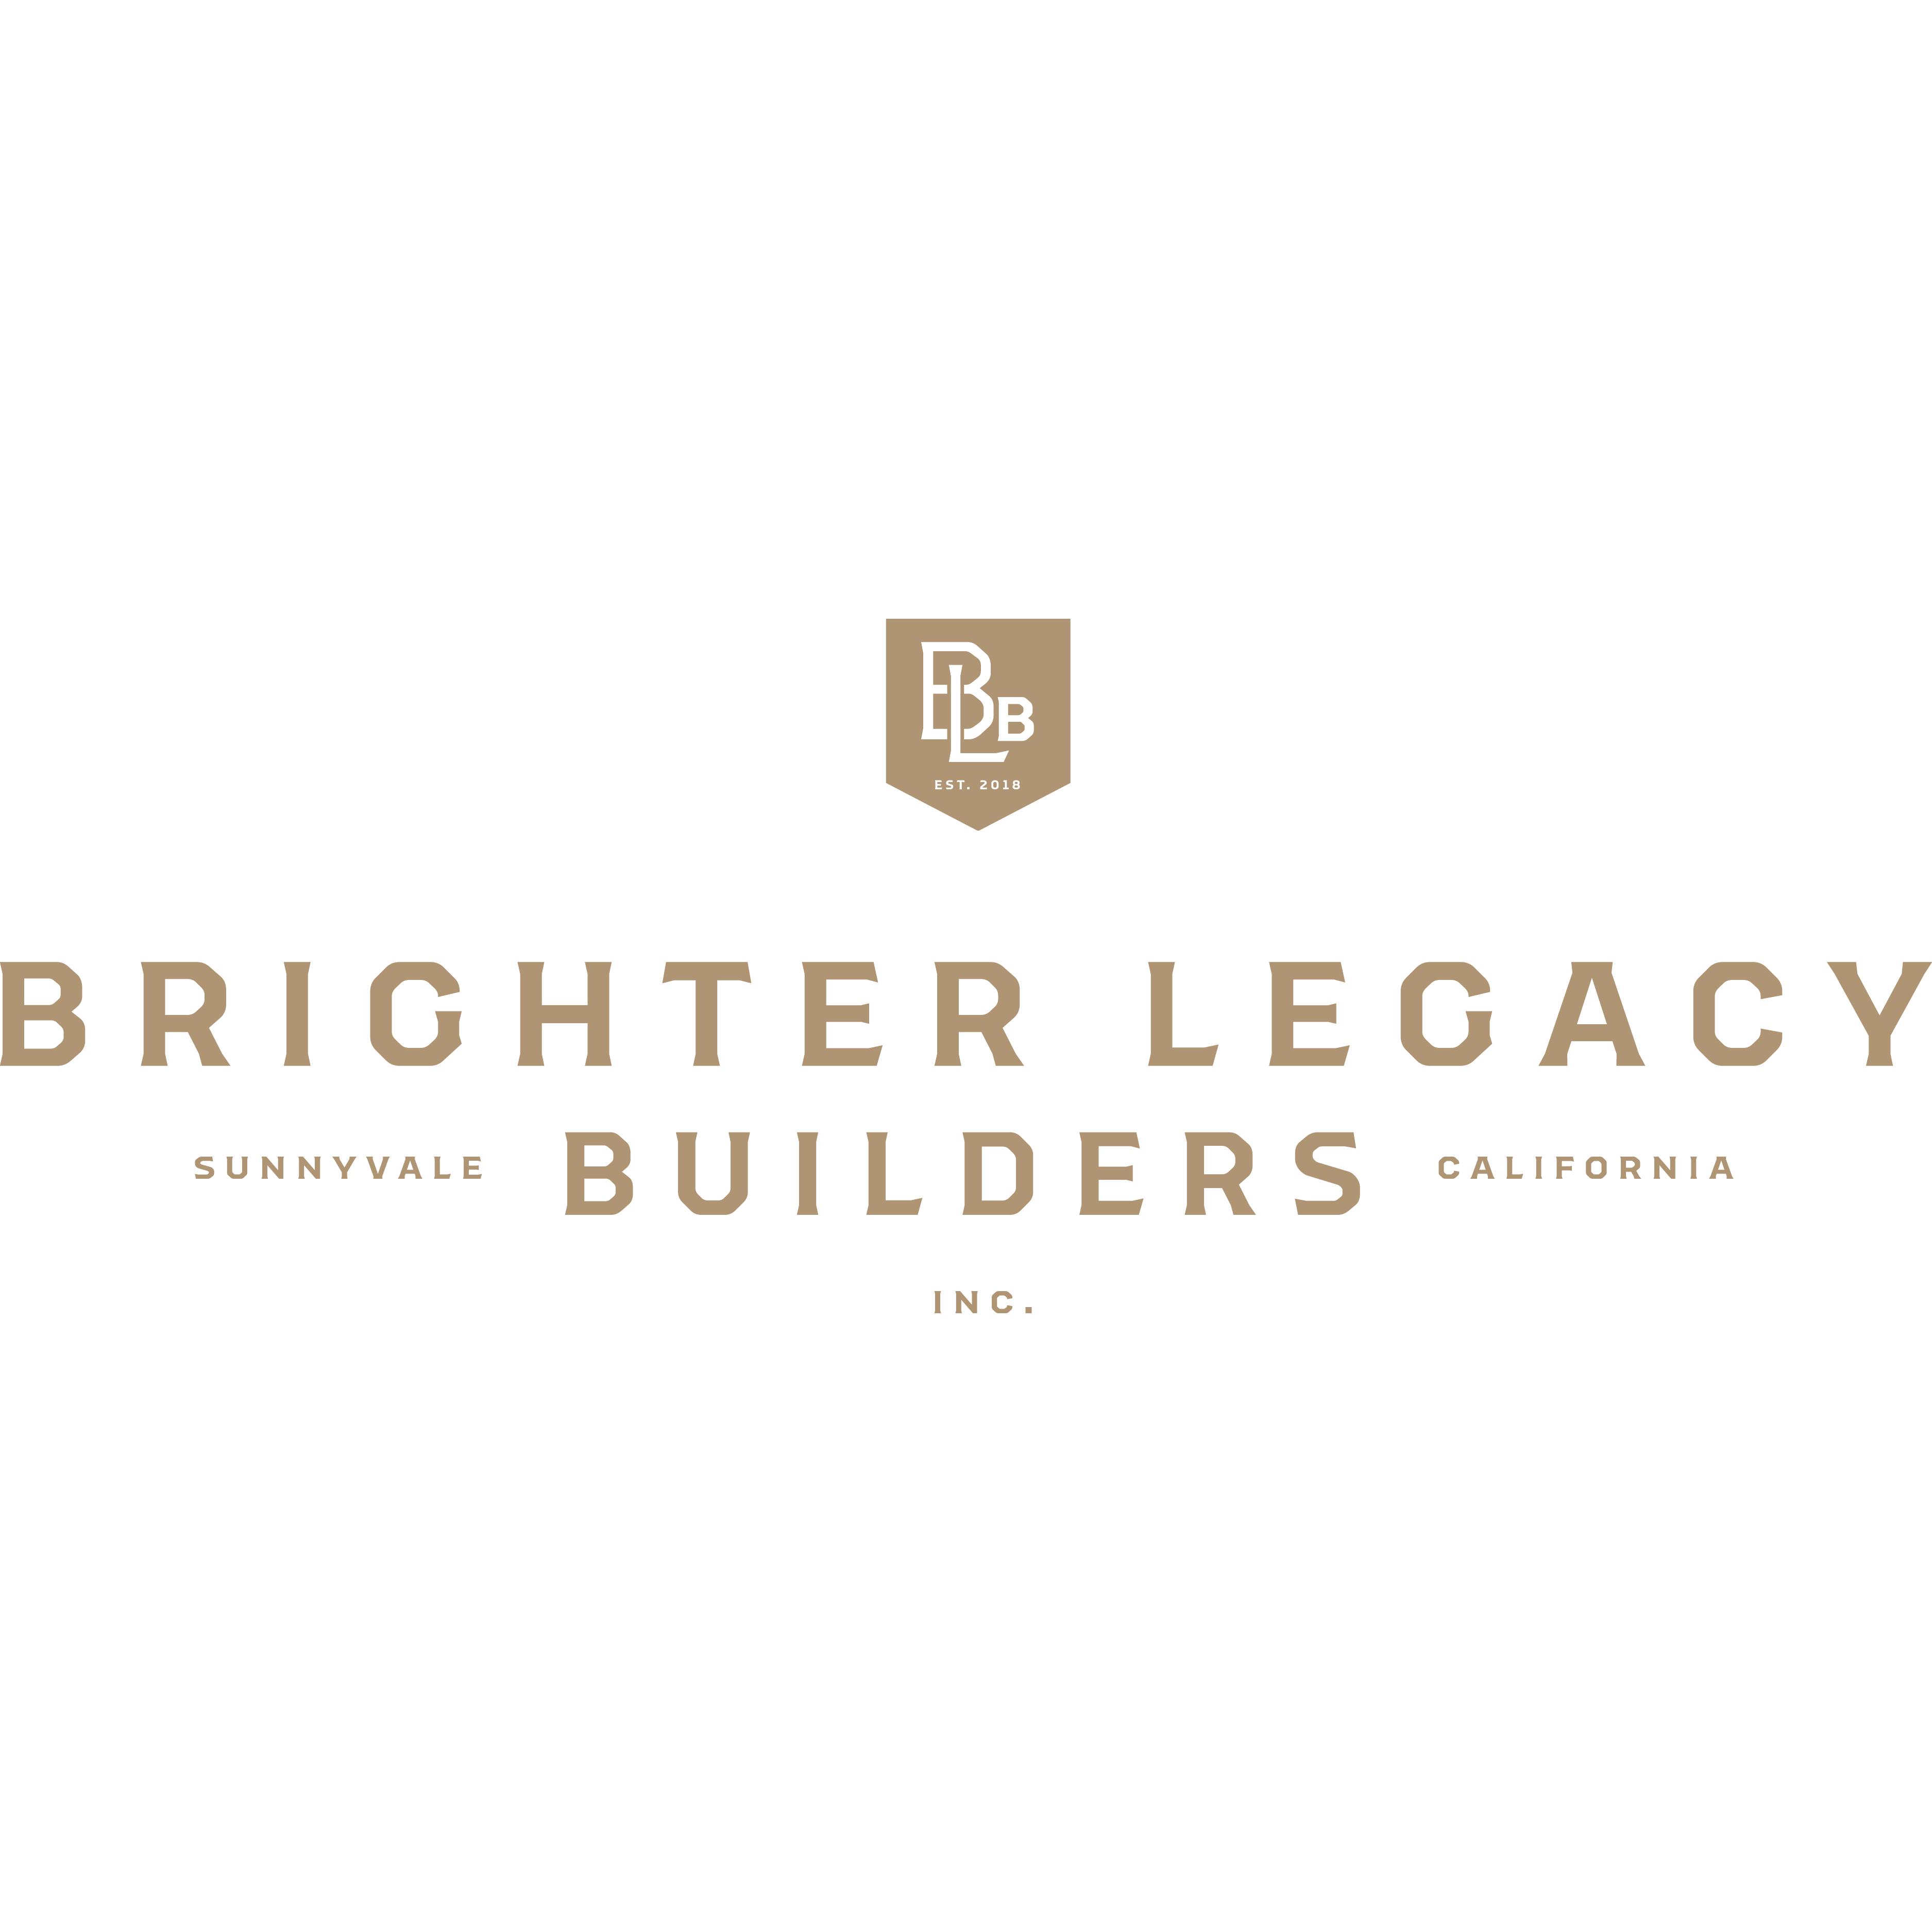 Brighter Legacy Builders logo